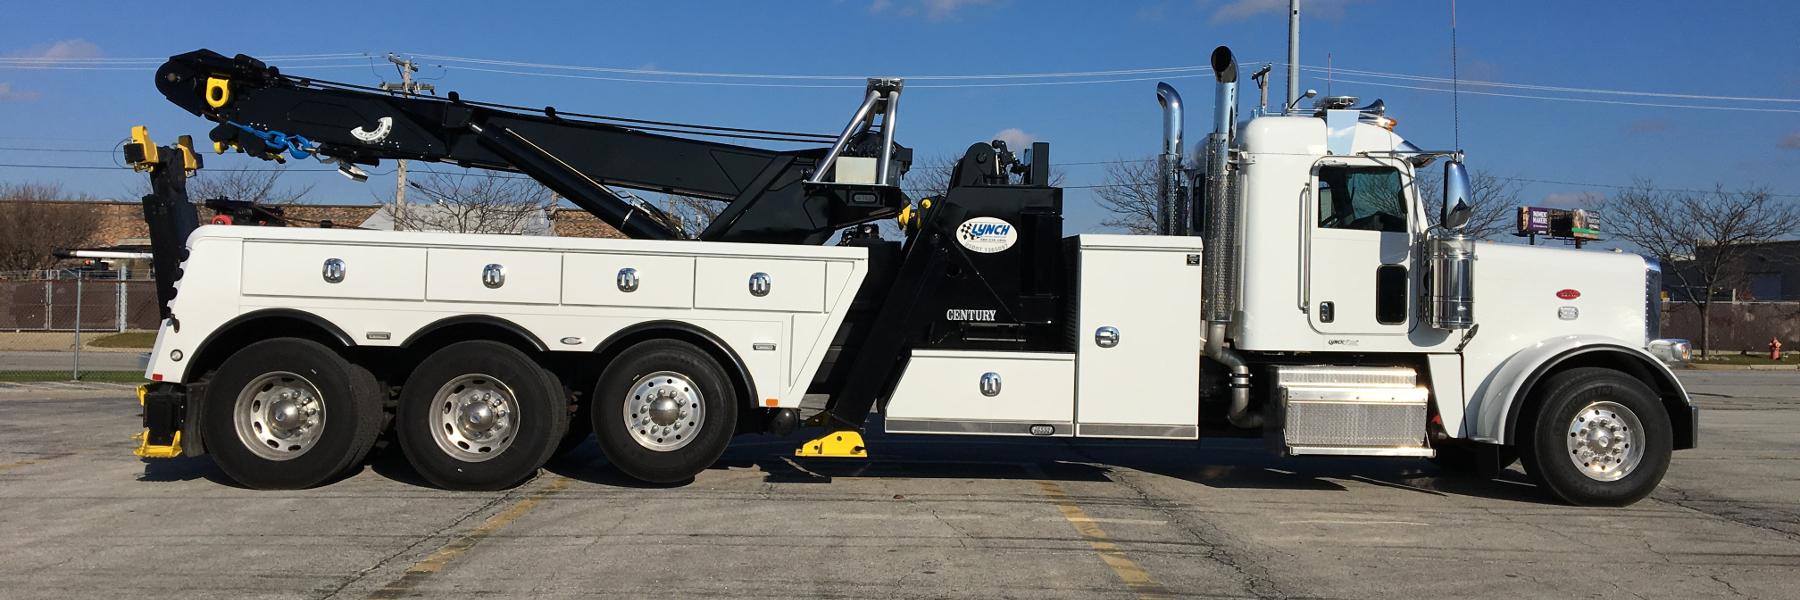 White Heavy Duty Tow Truck